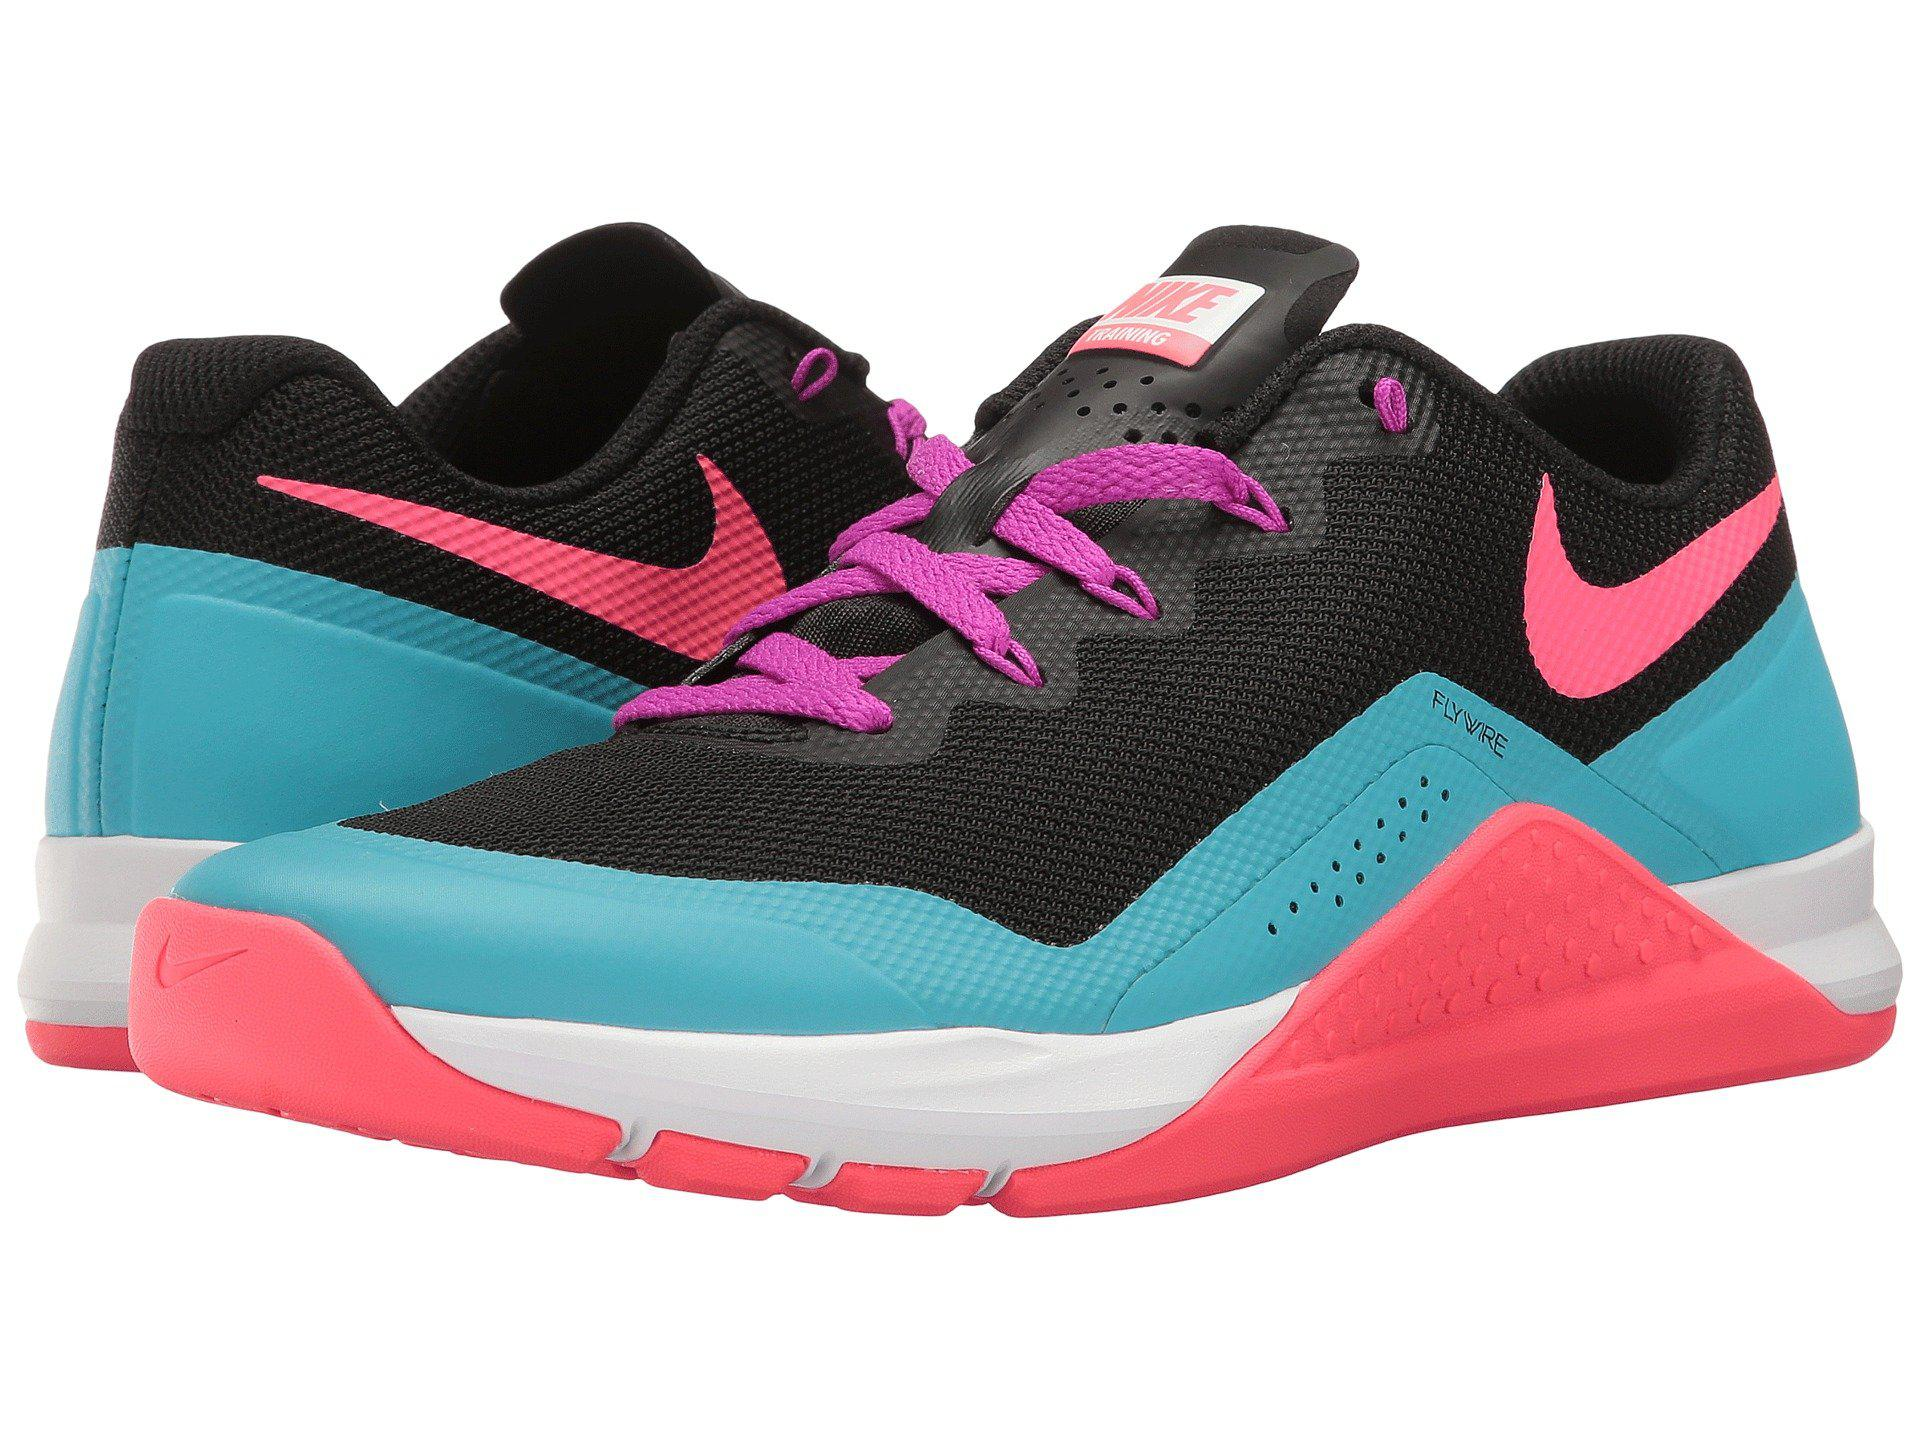 Nike Metcon Repper D lXEob